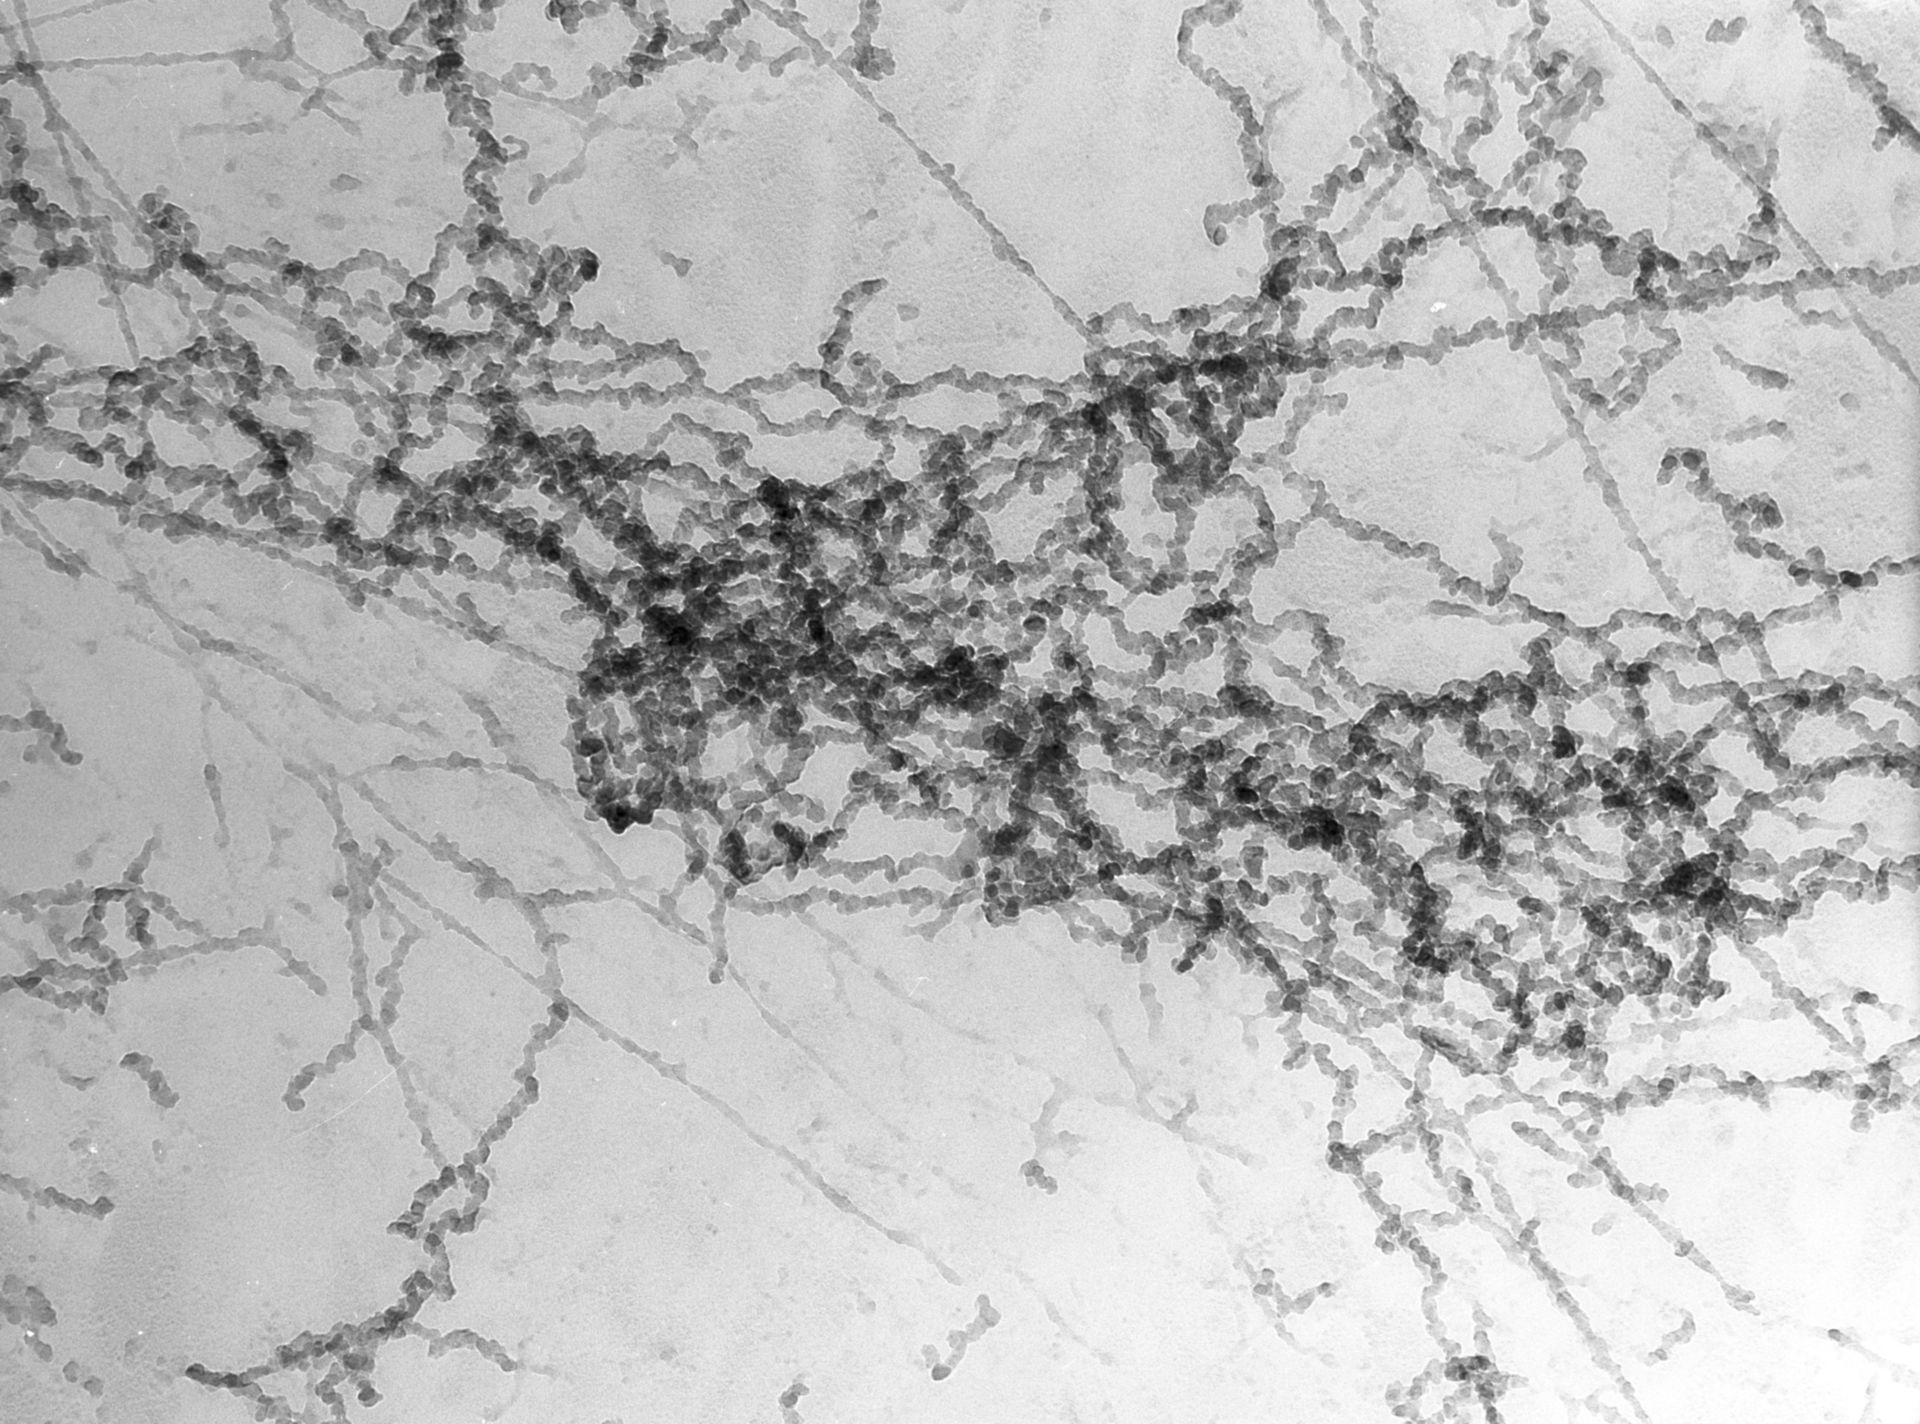 Notopthalmus viridescence (Nuclear chromatin) - CIL:10081